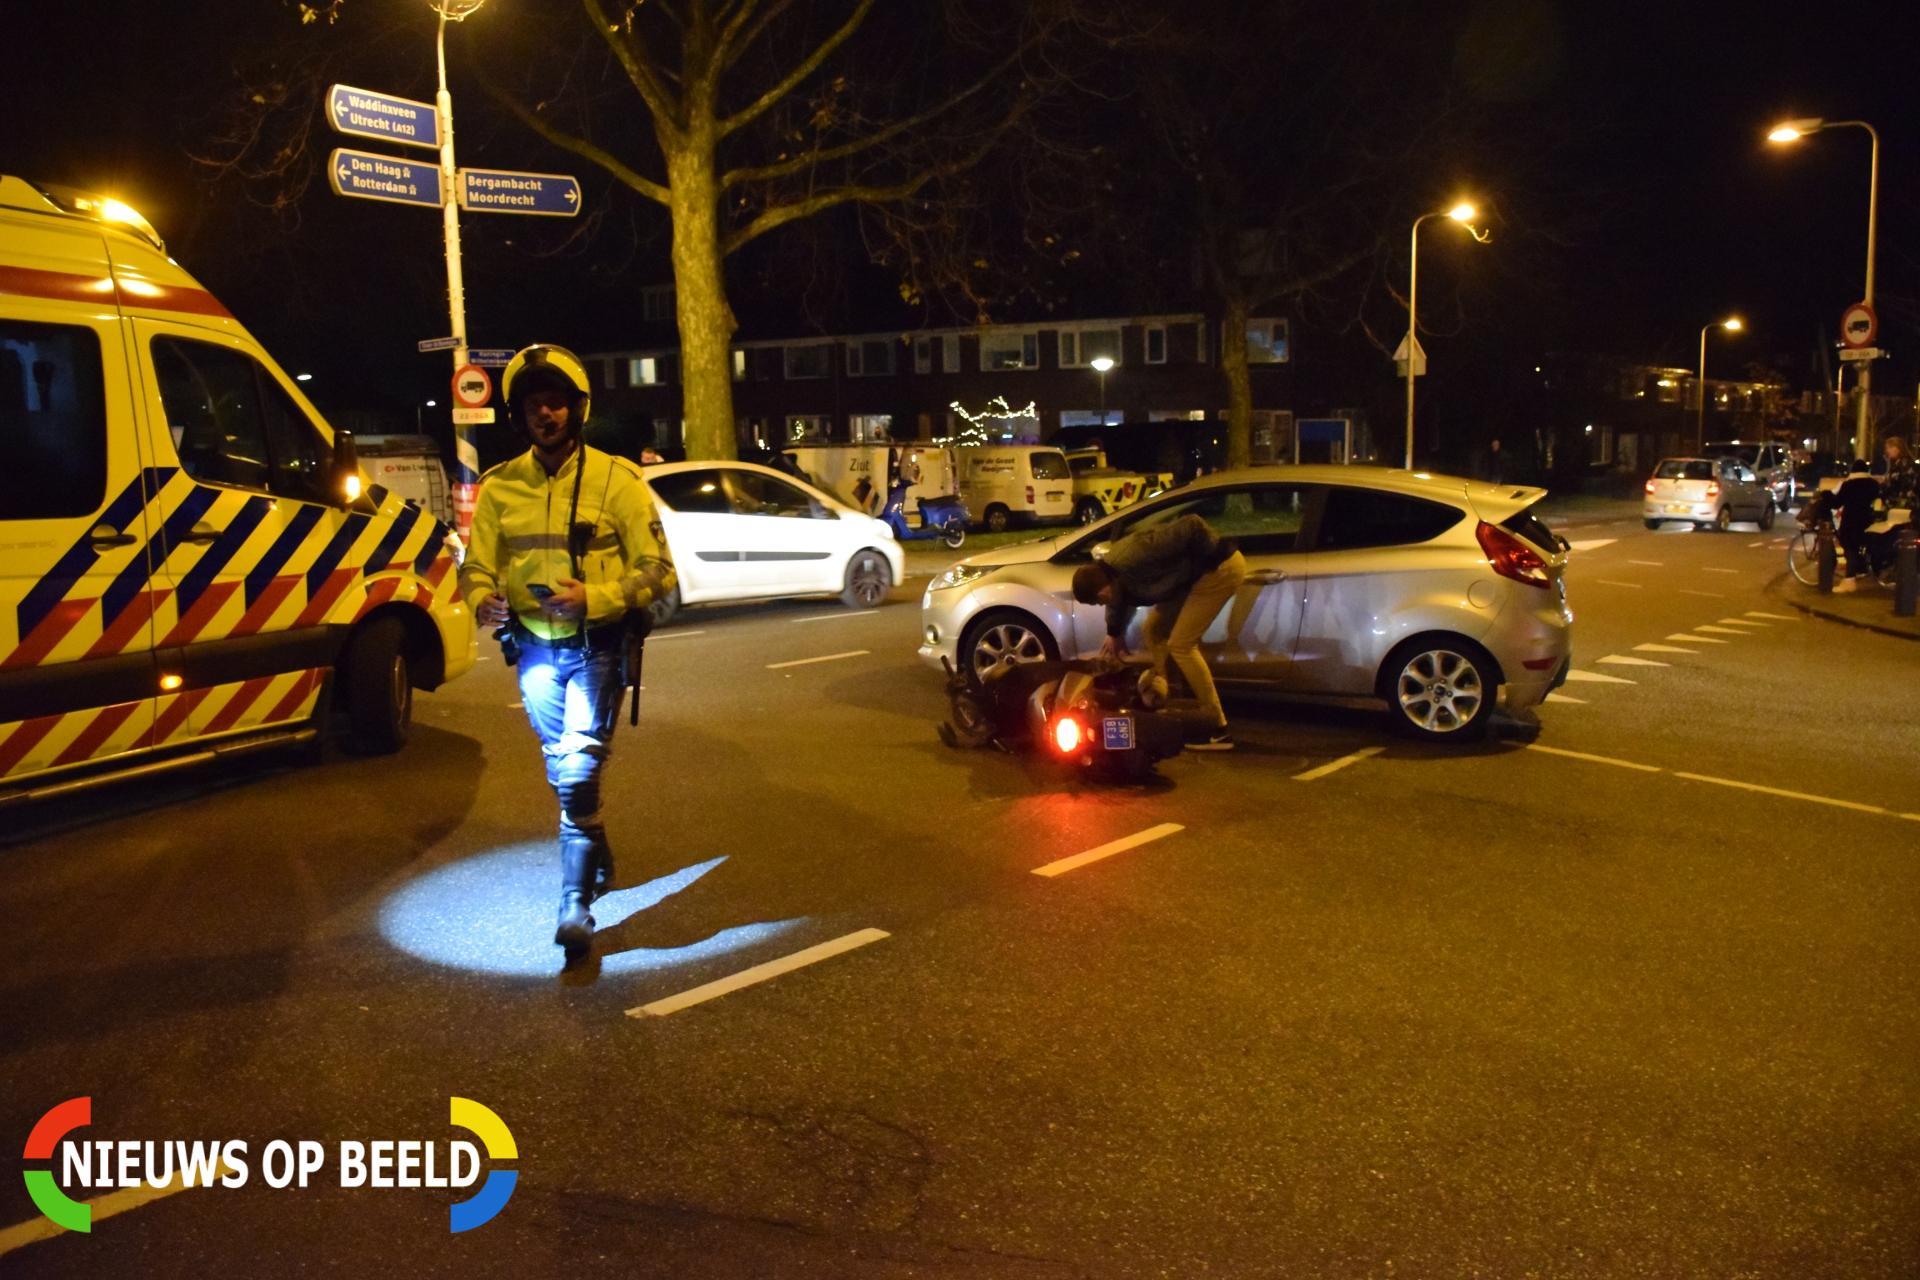 Scooterrijder gewond na botsing met auto Koningin Wilhelminaweg Gouda